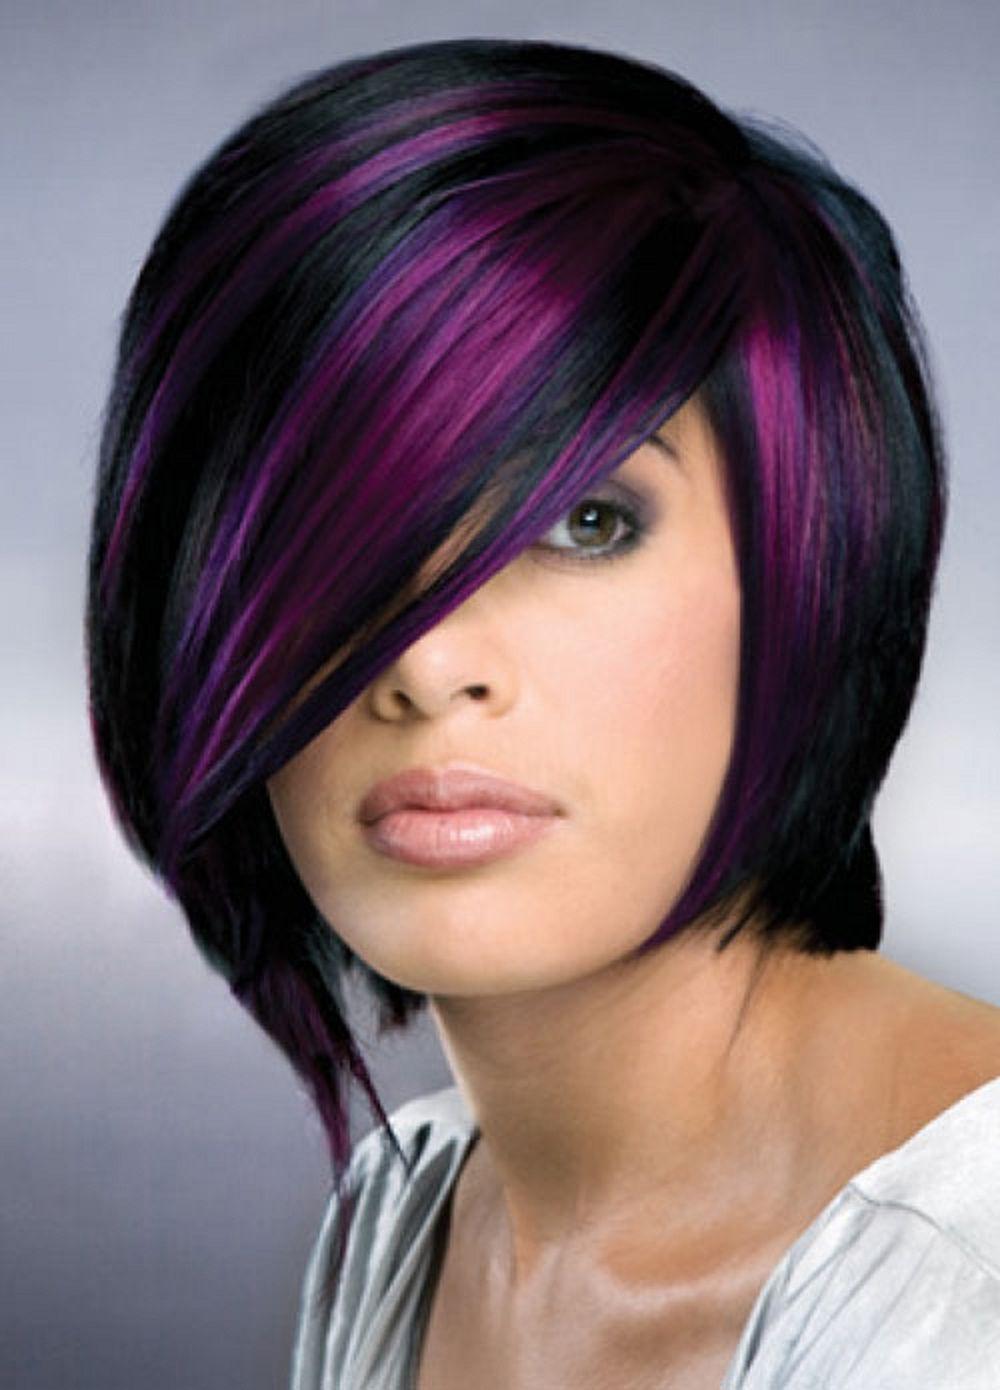 hair color ideas for short brown hair   NEWHAIR   Short hairstyles ...